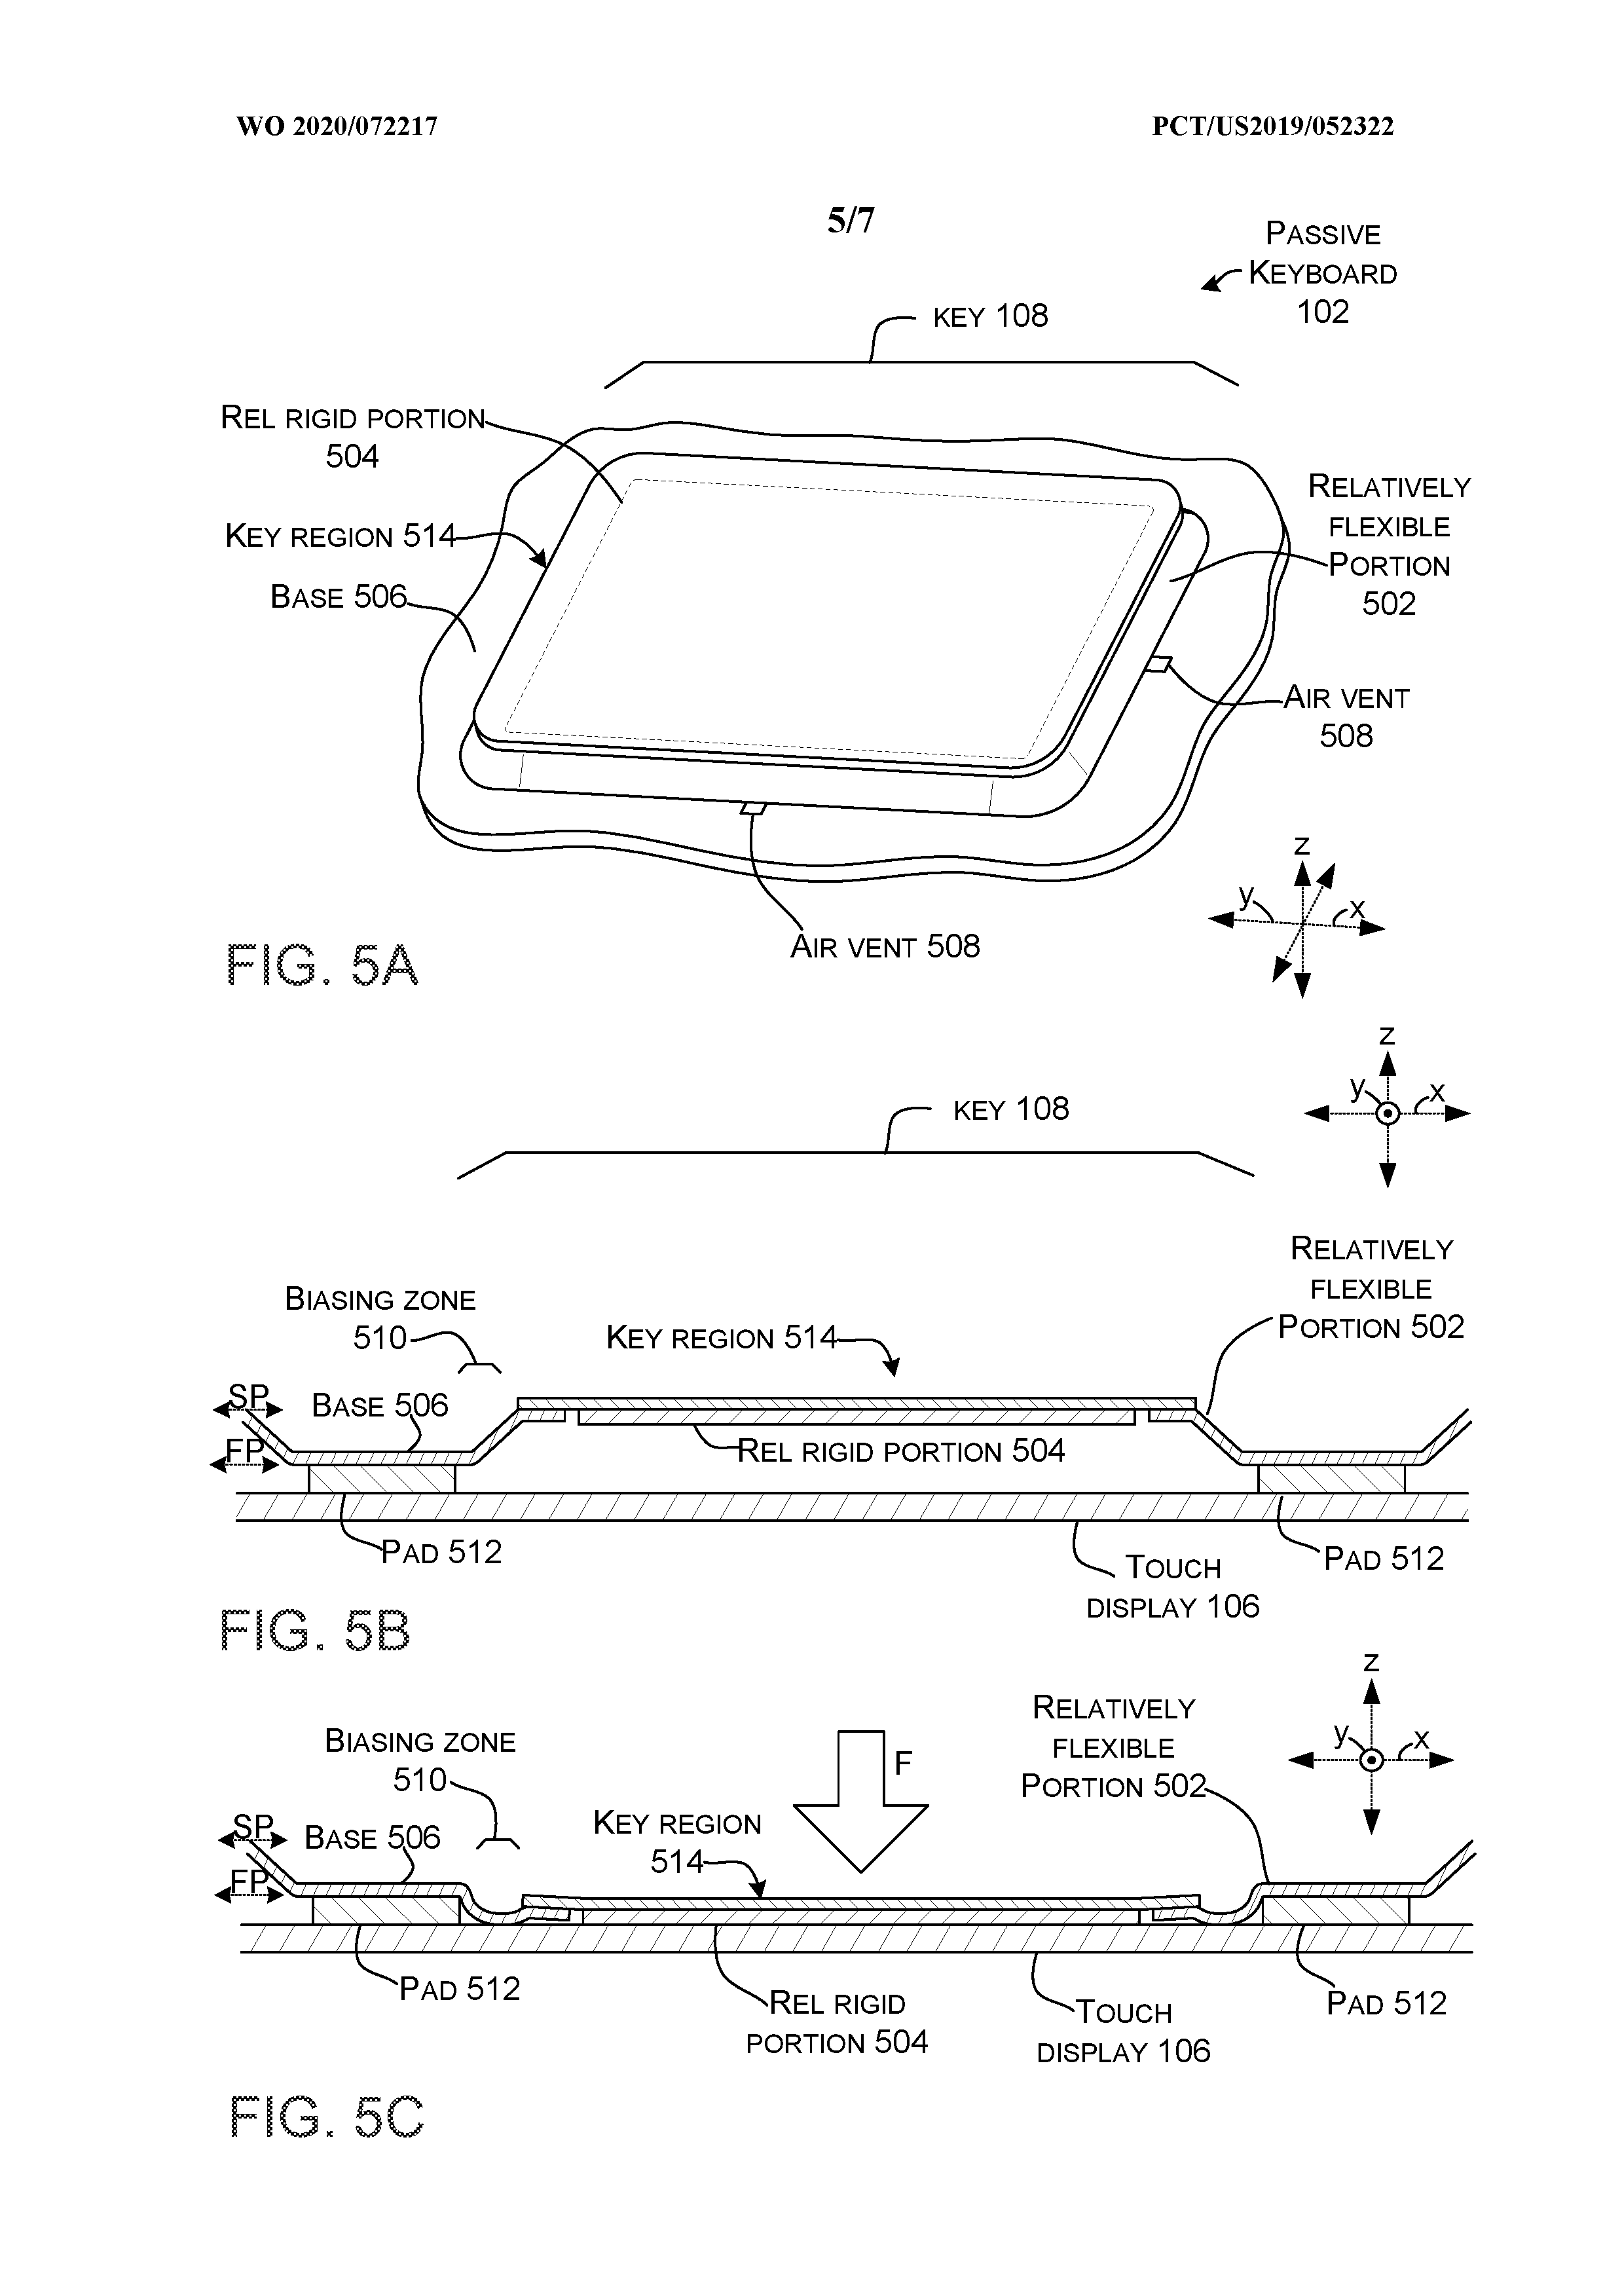 surface neo keyboard